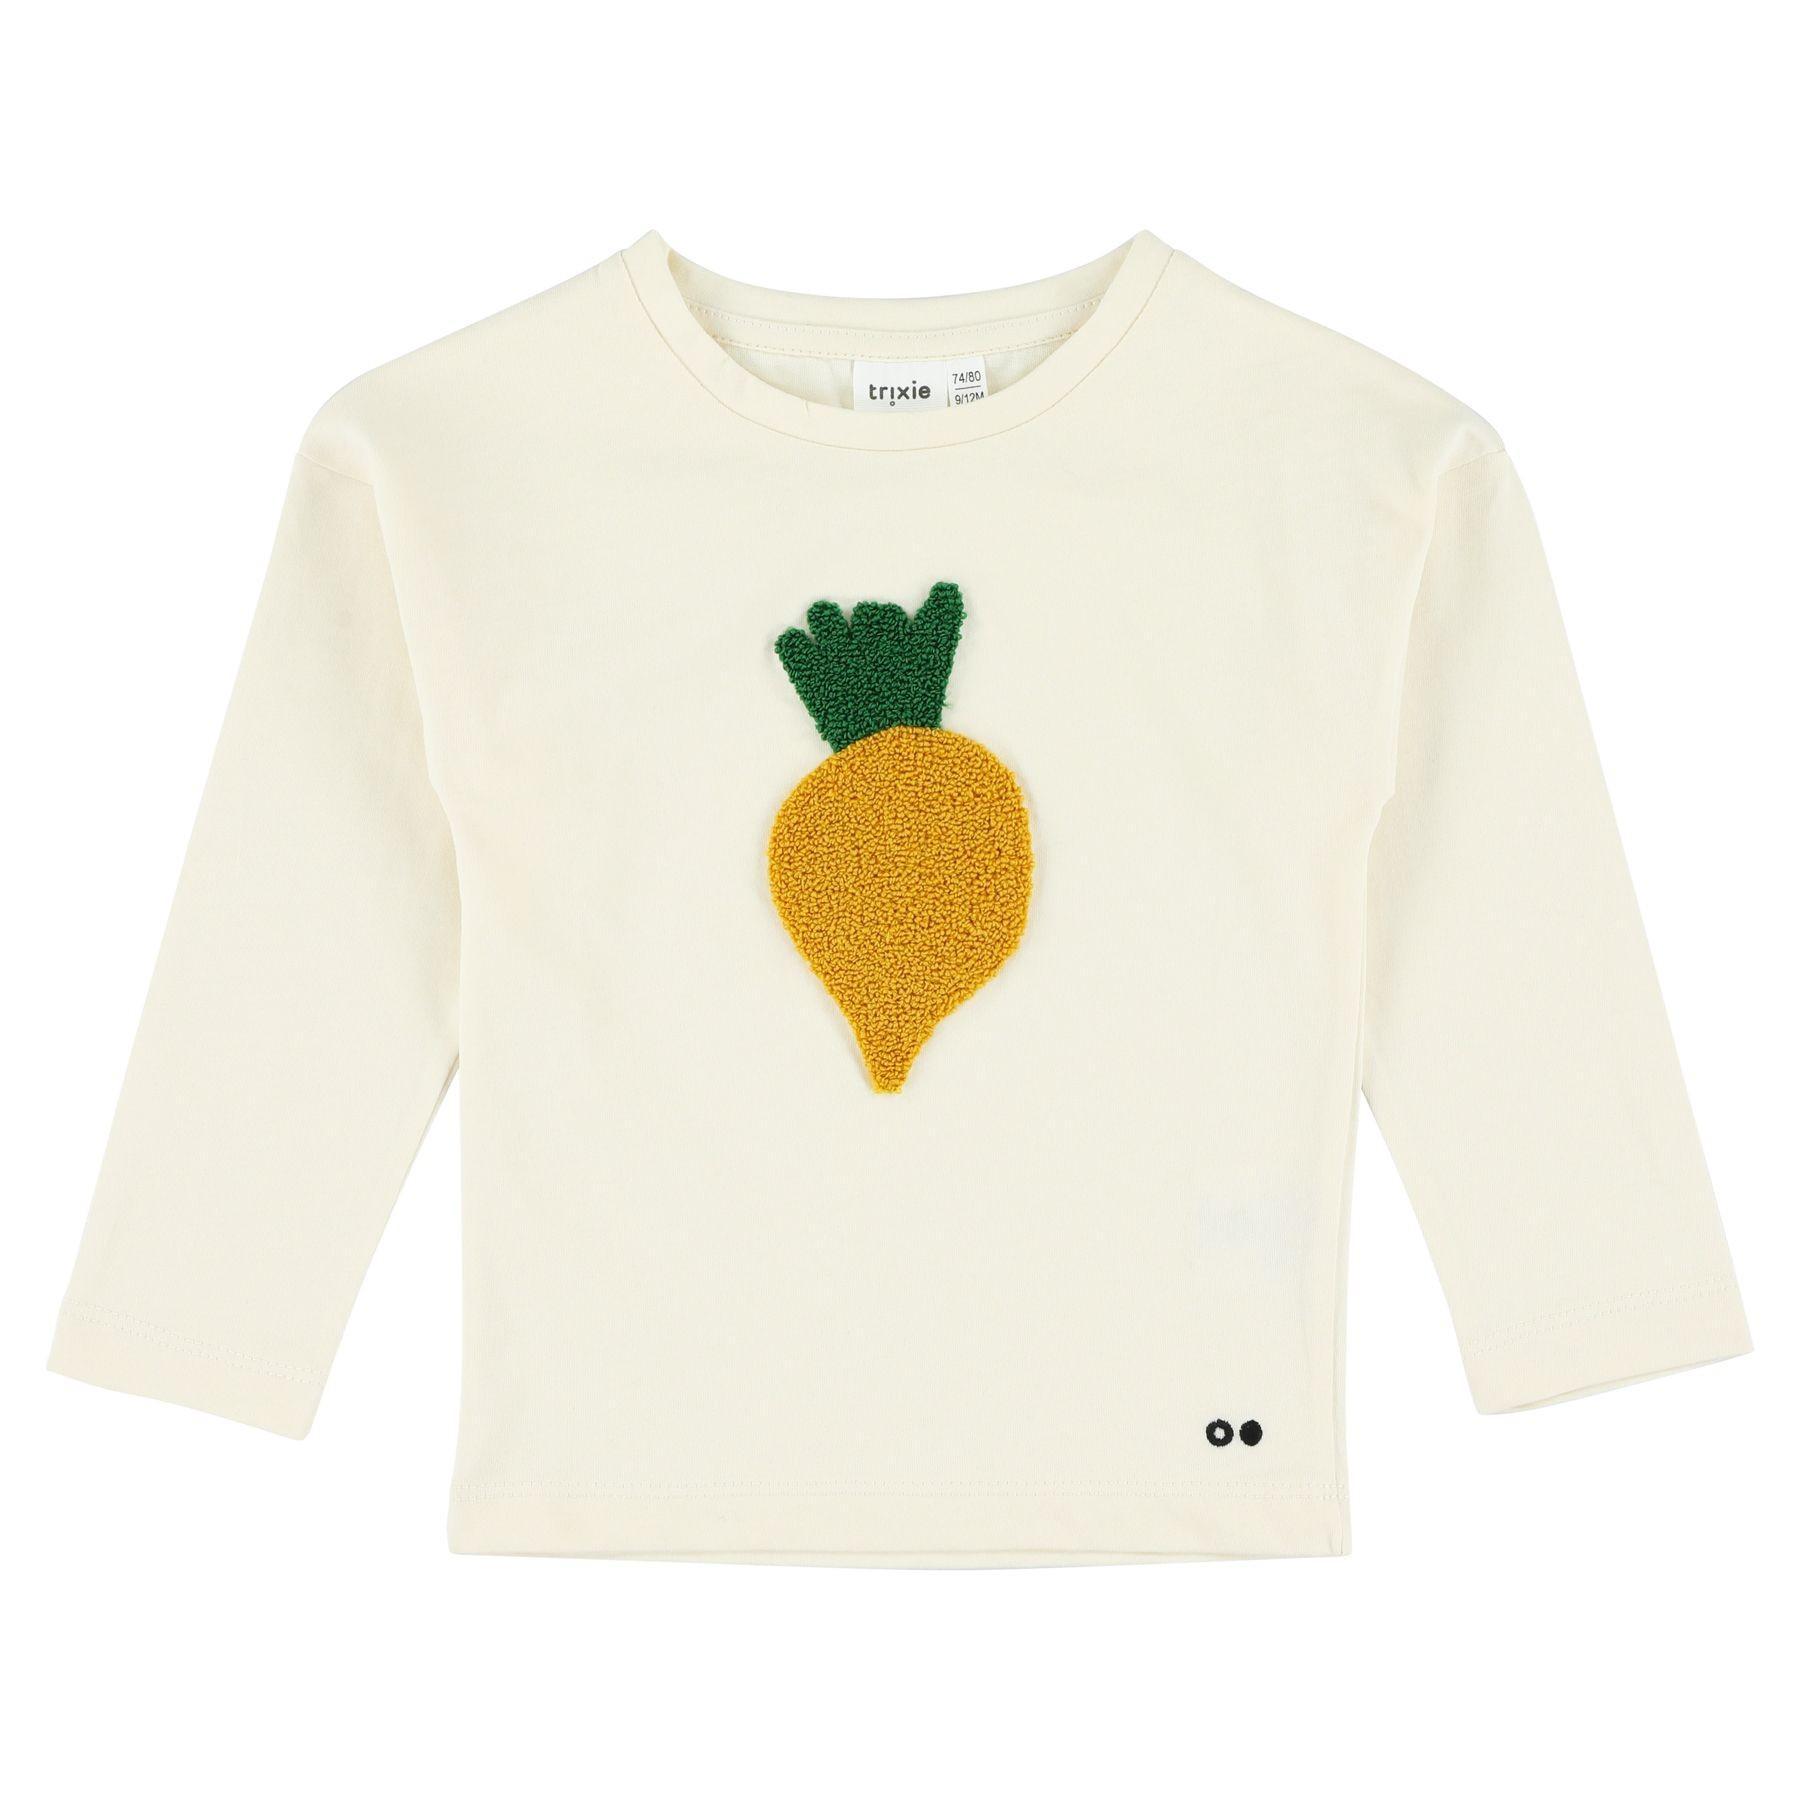 Trixie - T-shirt lange mouwen Tiny Turnip - 6Y